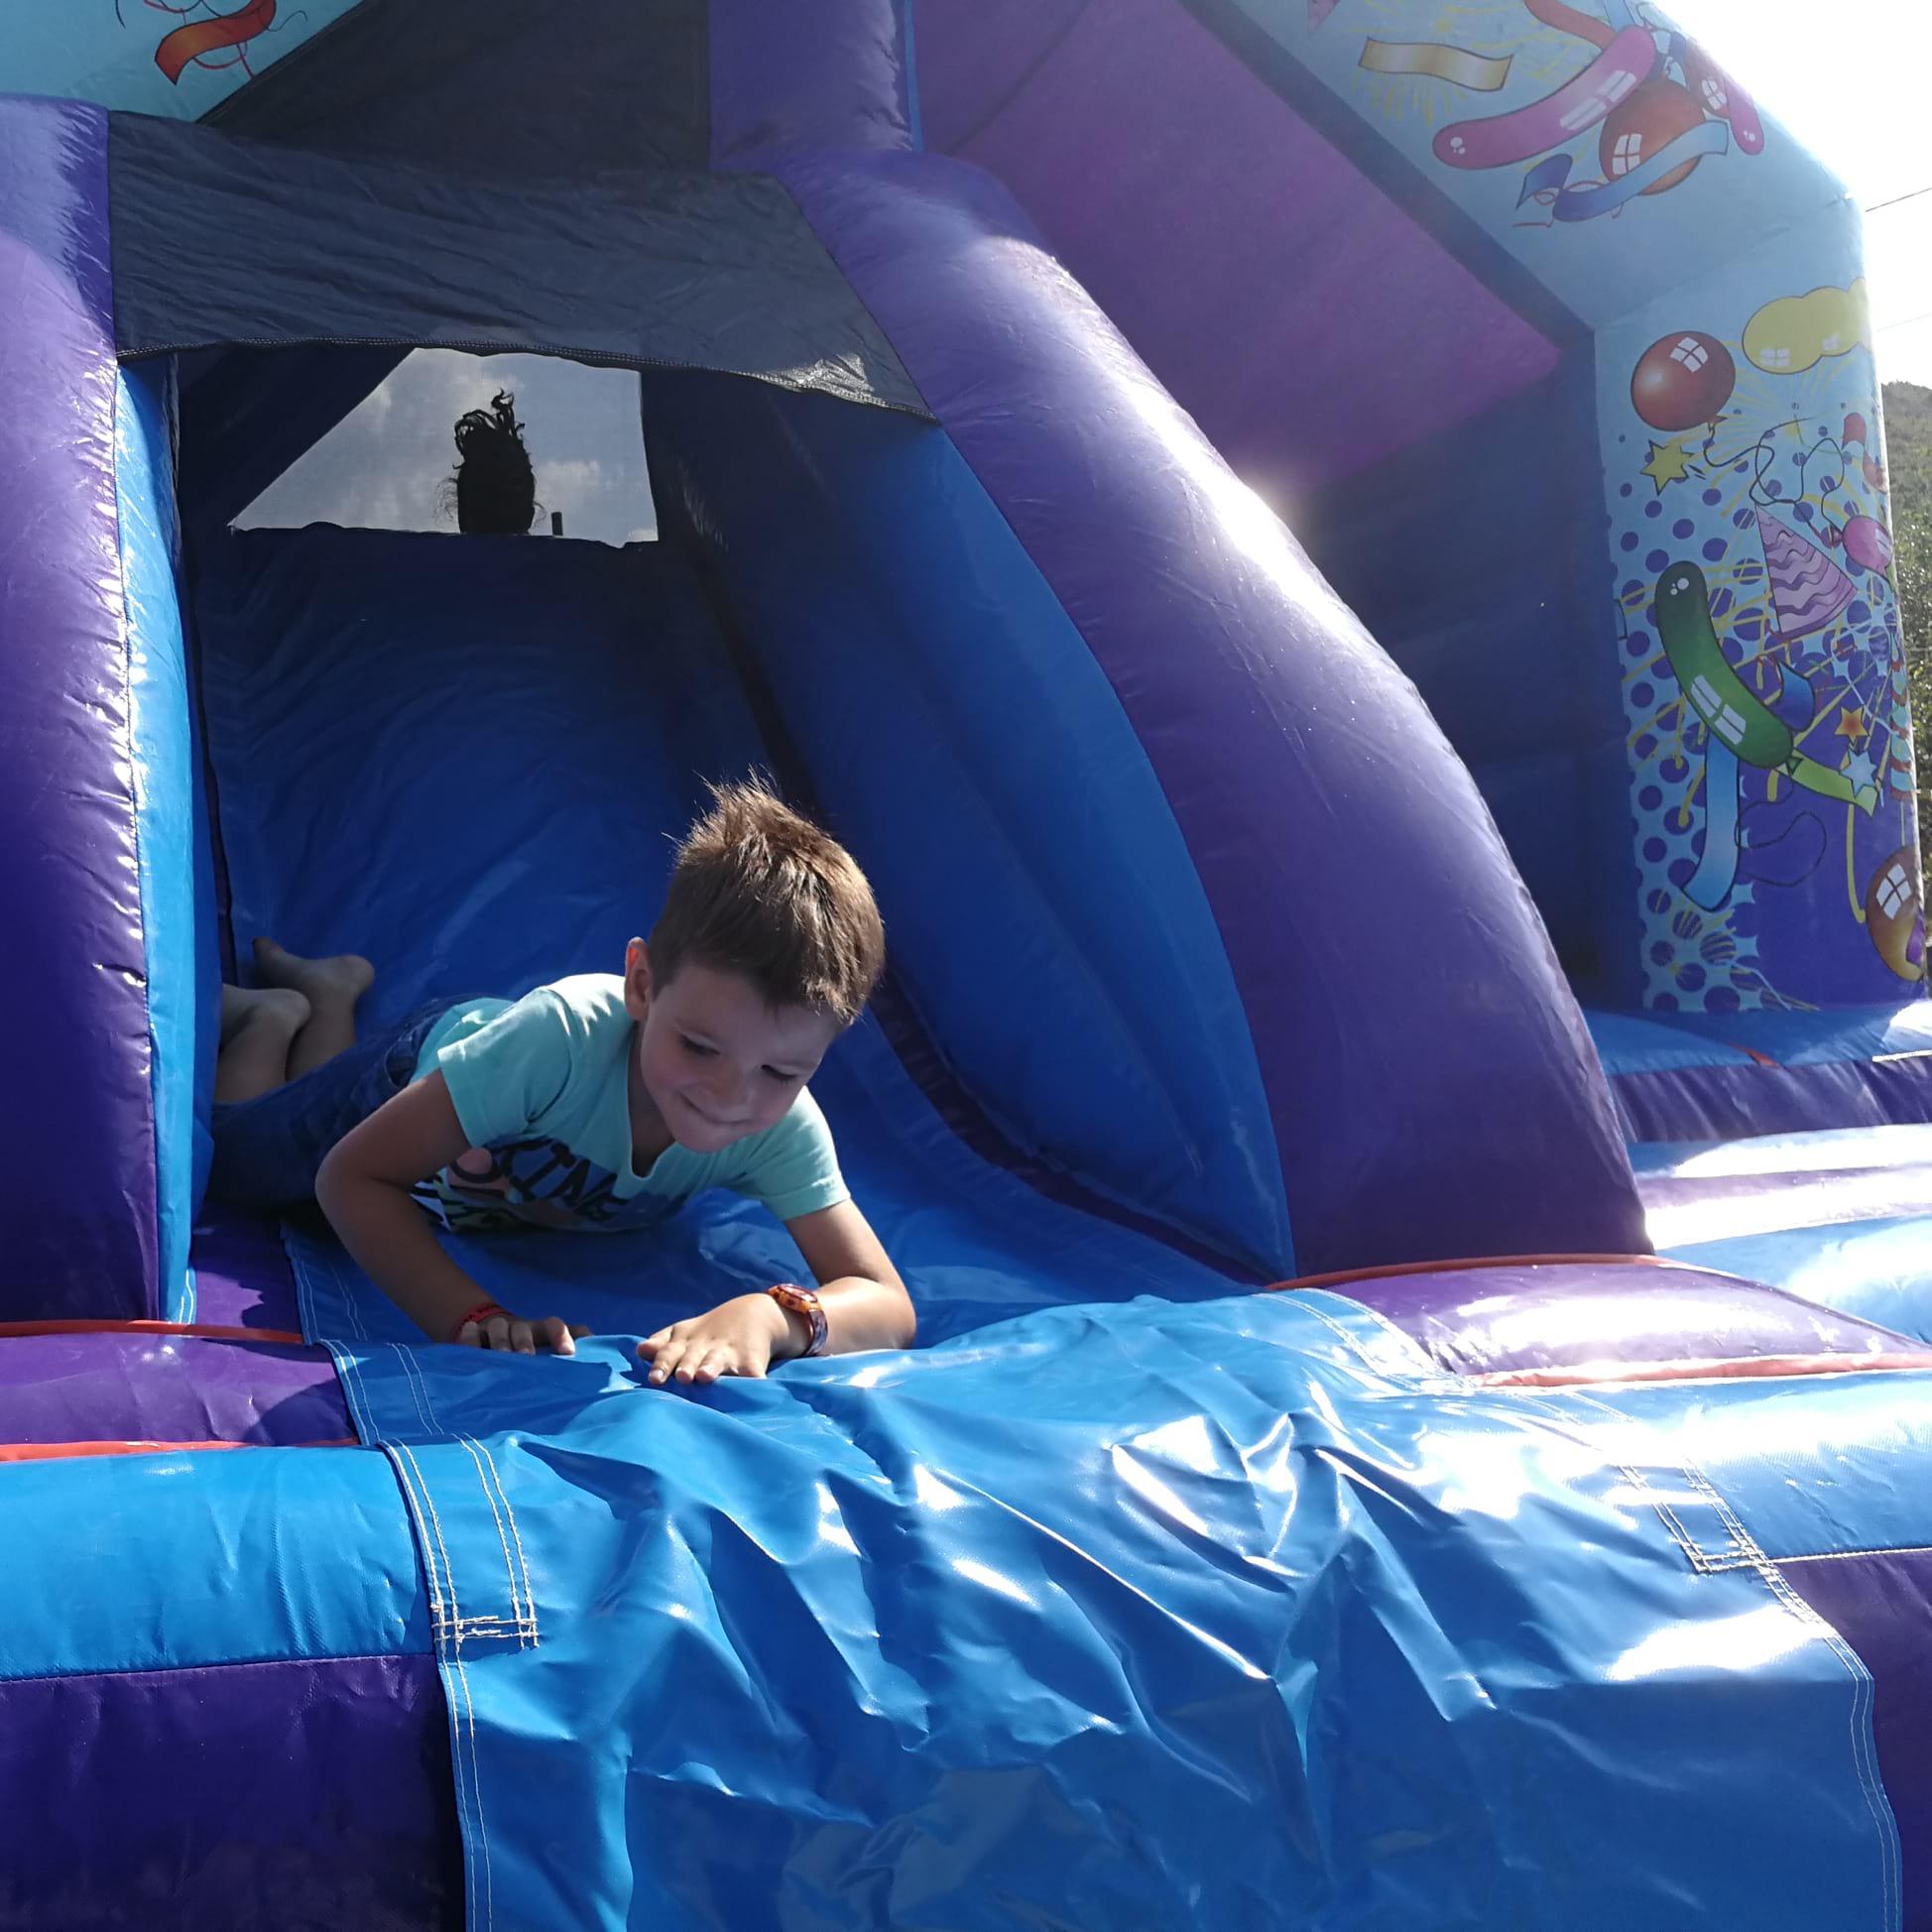 party-time-petreceri-copii-sibiu-gonflabila-tobogan-3